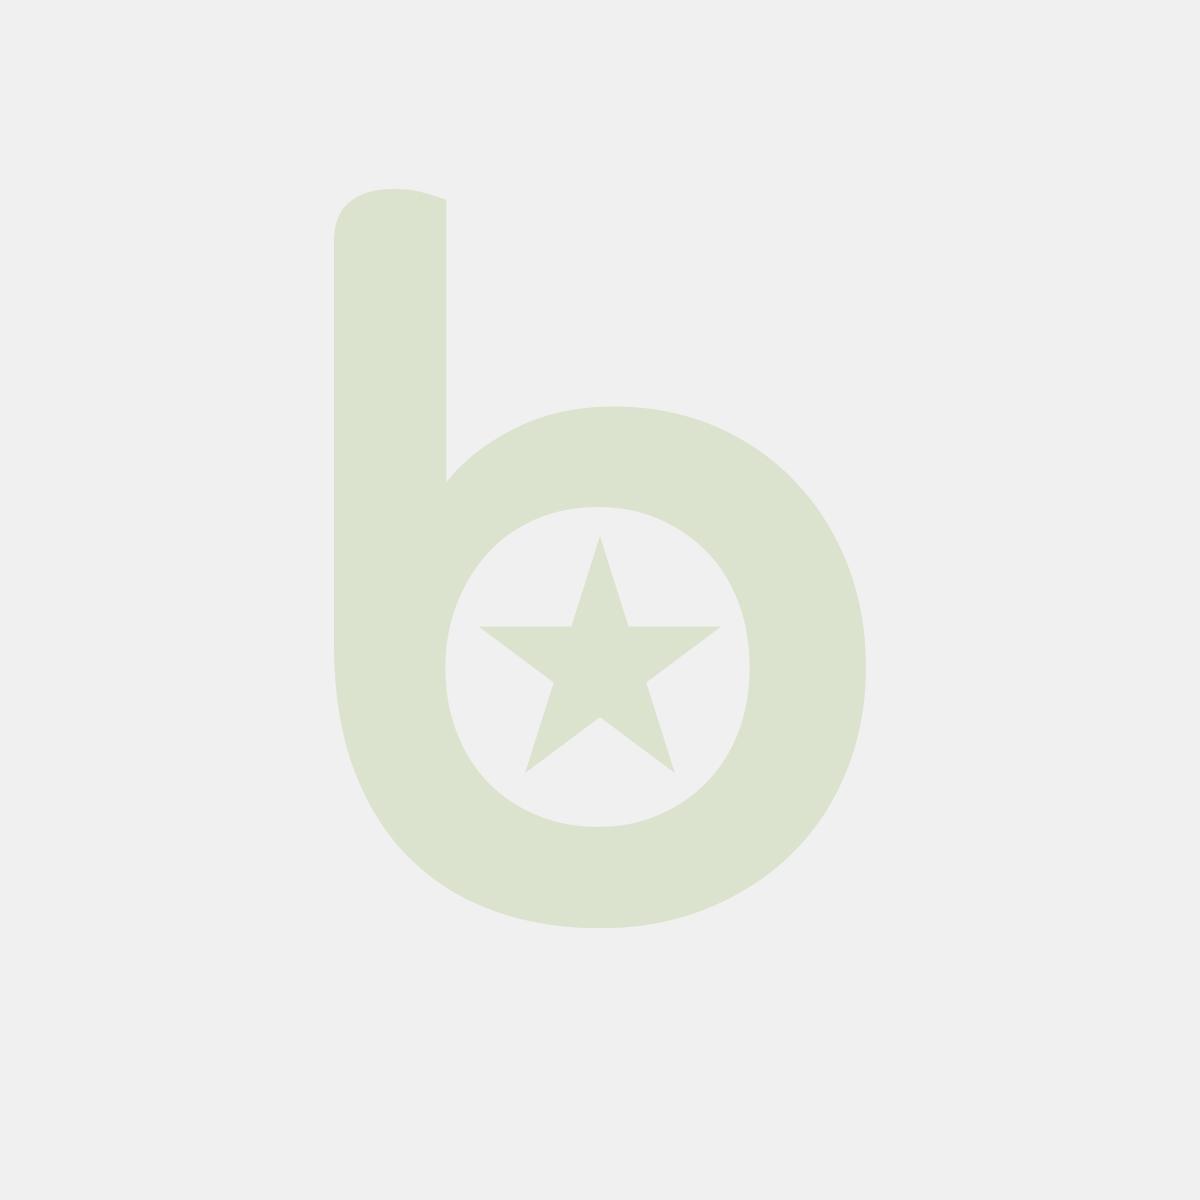 Cienkopis SCHNEIDER Line-Up Touch, 0,4mm, czerwony